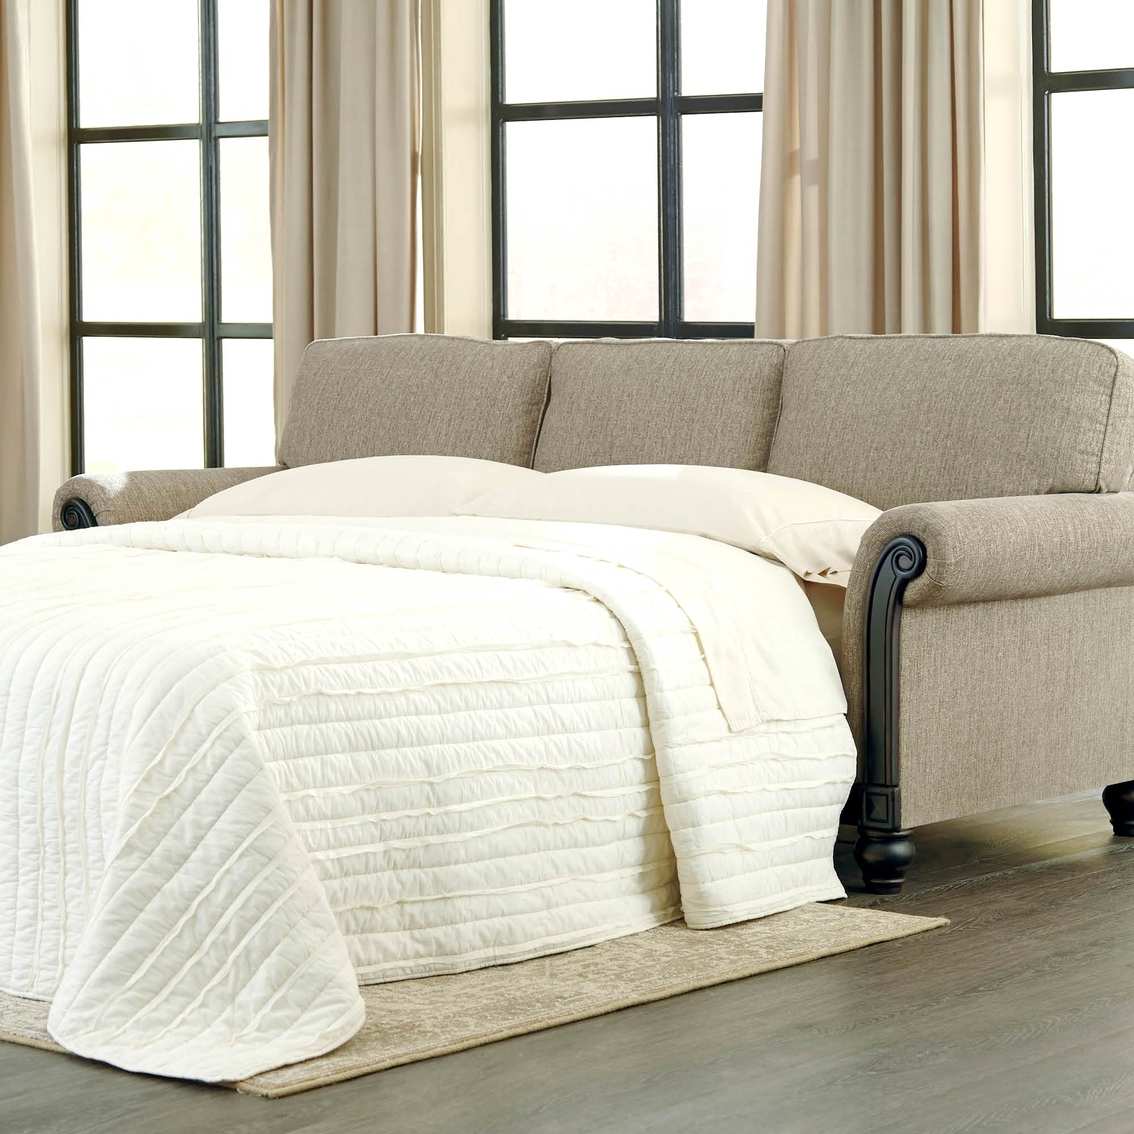 Phenomenal Signature Design By Ashley Blackwood Queen Sofa Sleeper Interior Design Ideas Truasarkarijobsexamcom